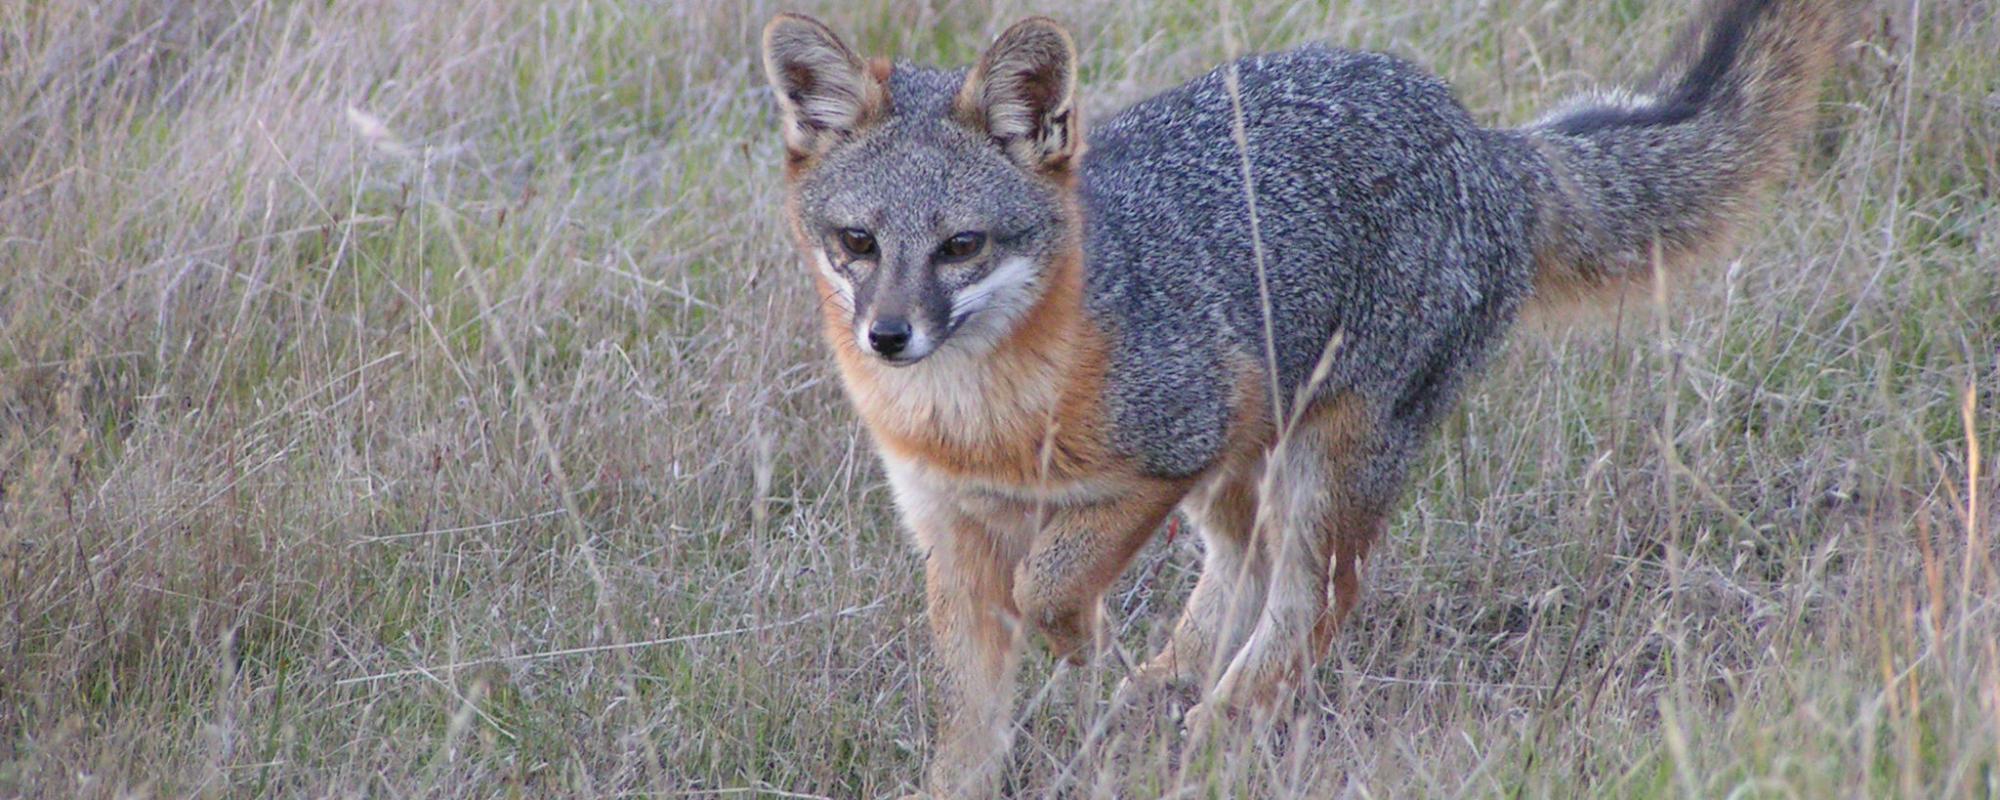 Male Santa Catalina Island fox